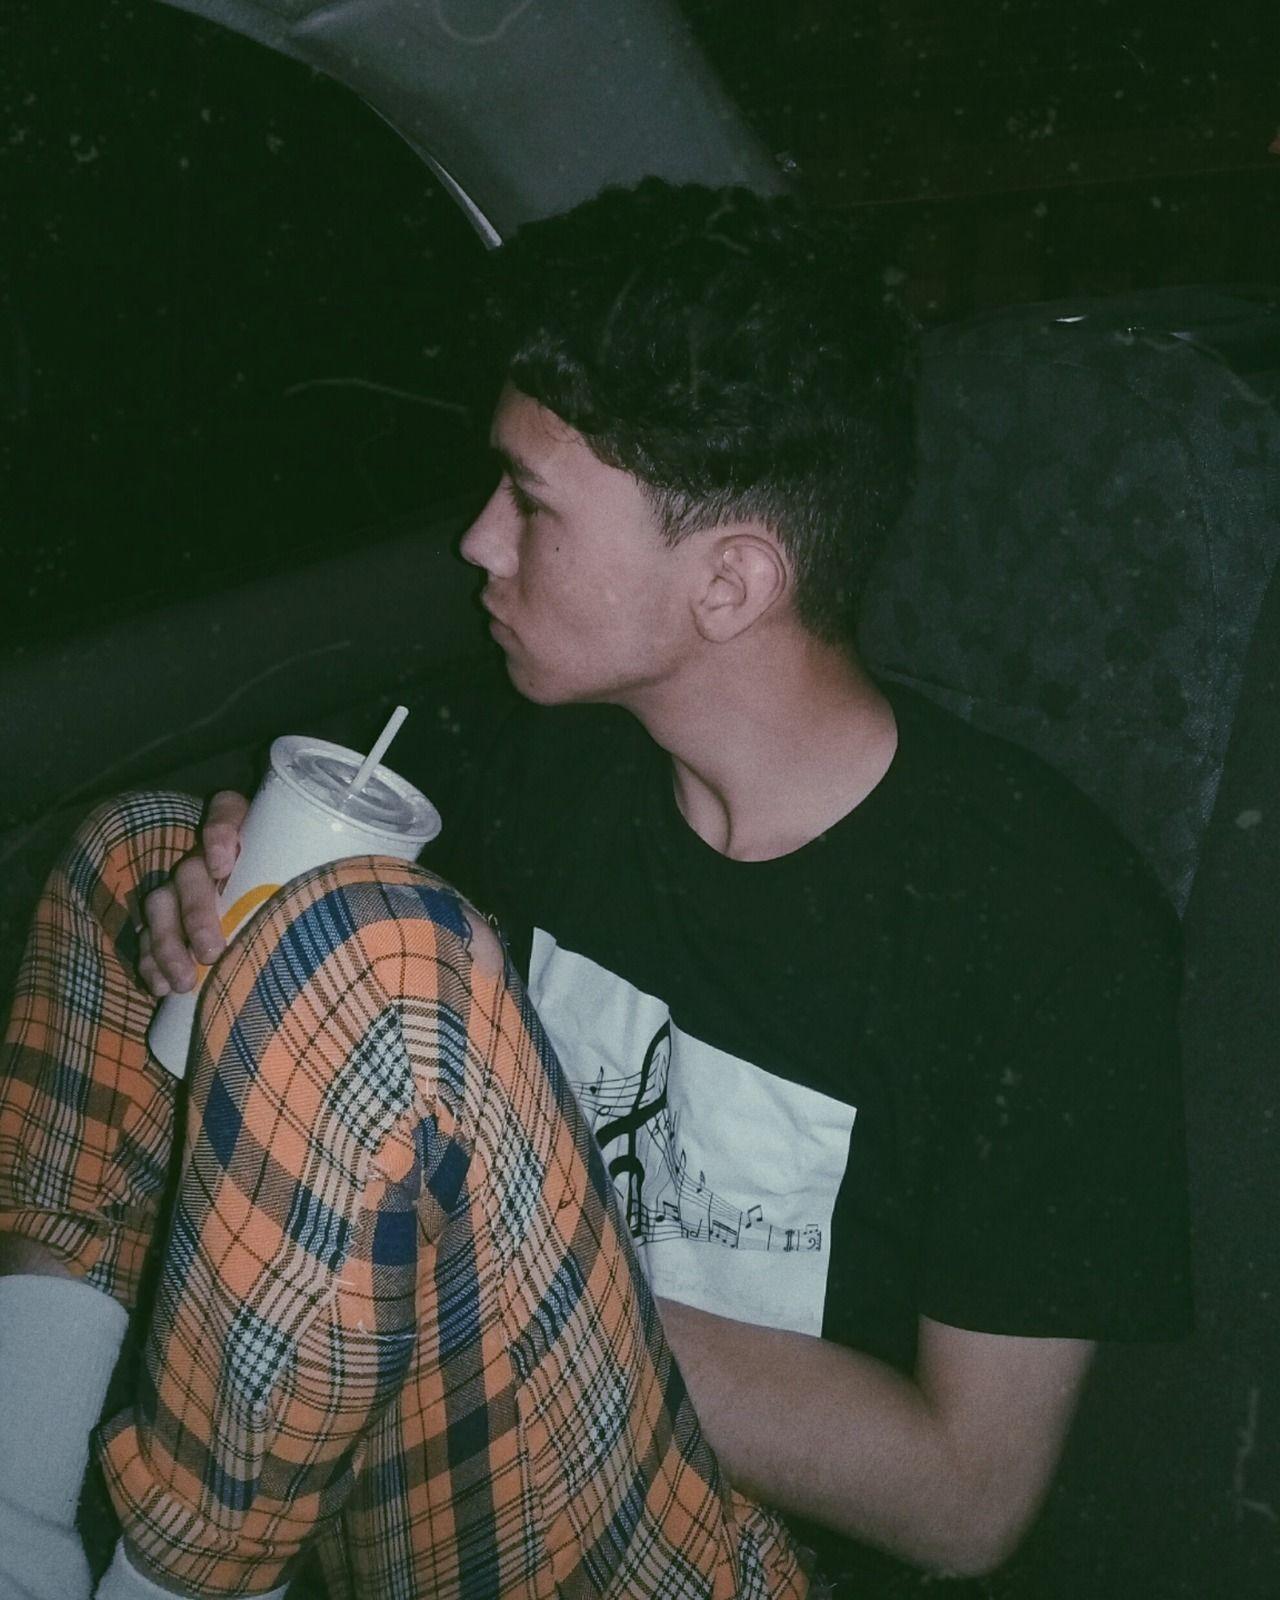 Tumblr Grunge Boy   Grunge photography, Grunge boy, Aesthetic guys